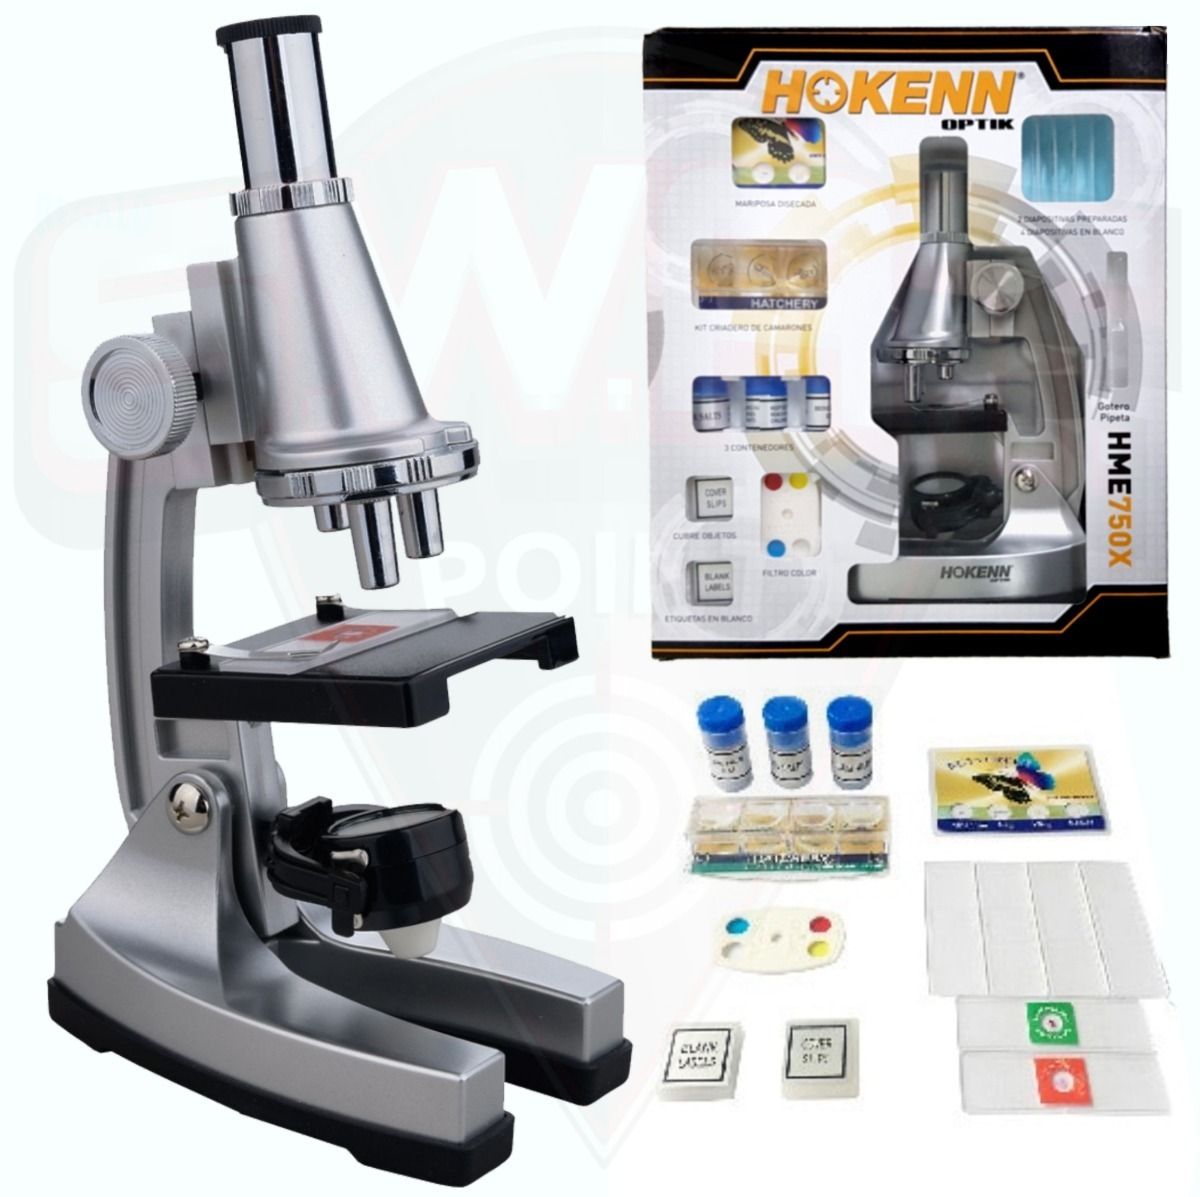 Microscopio Hokenn 750x Zoom Luz Accesorios Visor Niños Swat